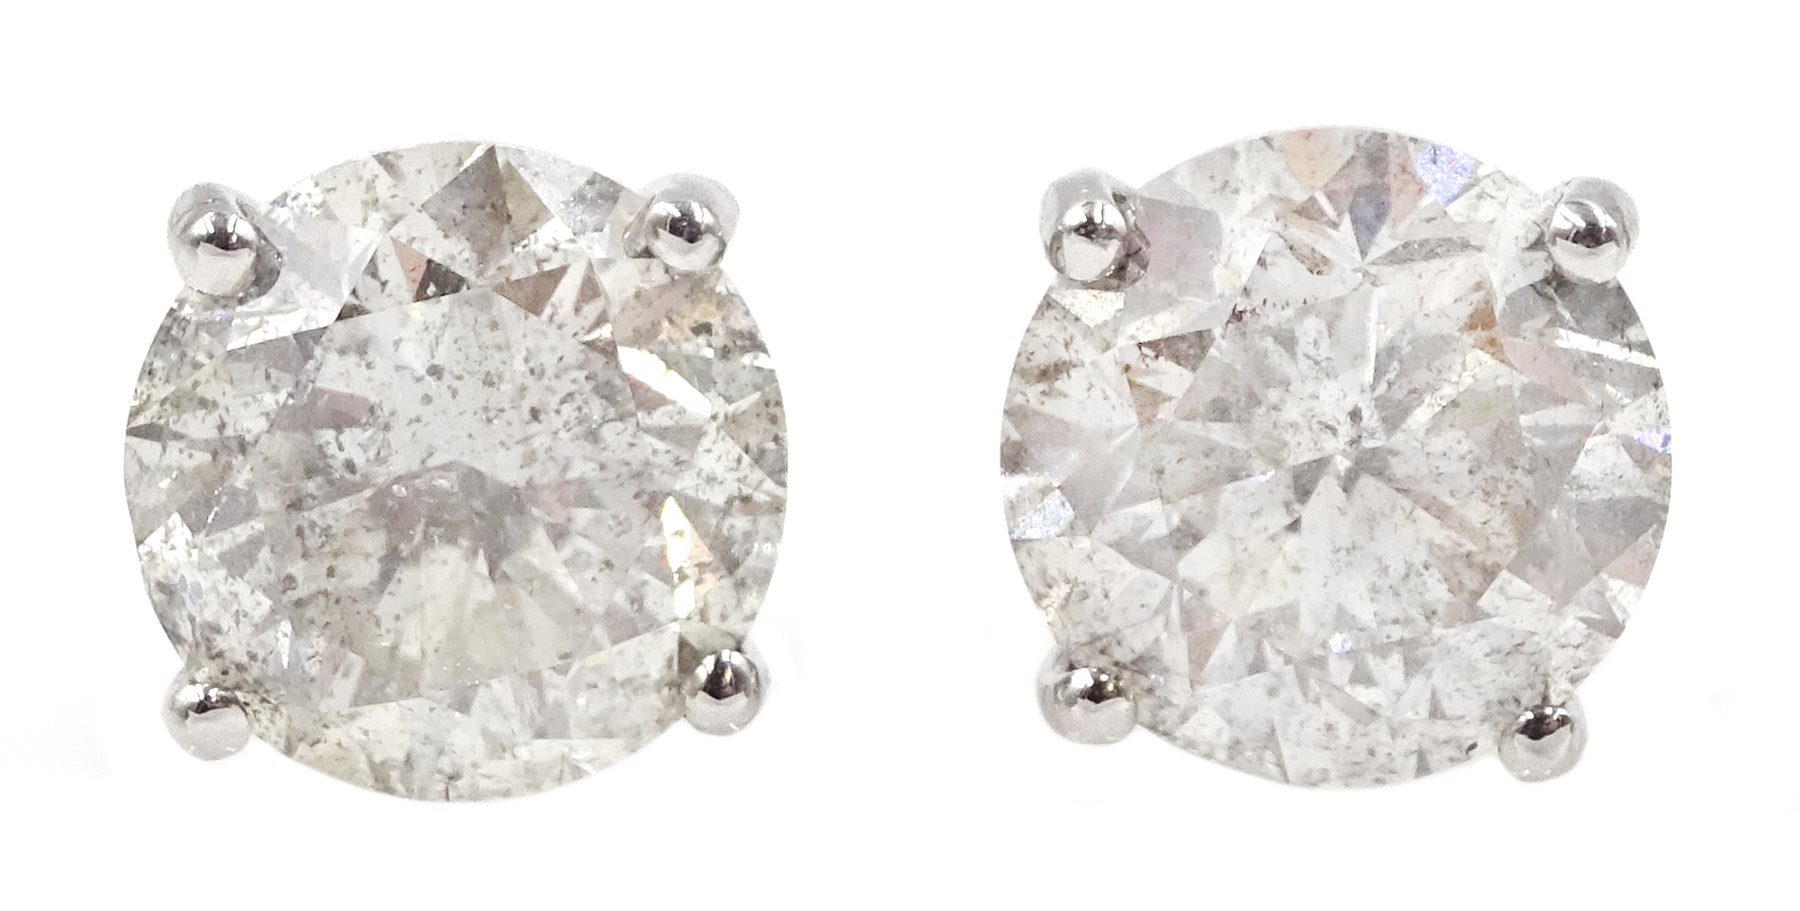 Pair of 18ct white gold diamond stud earrings, stamped 750, diamond total weight 3.52 carat, free UK